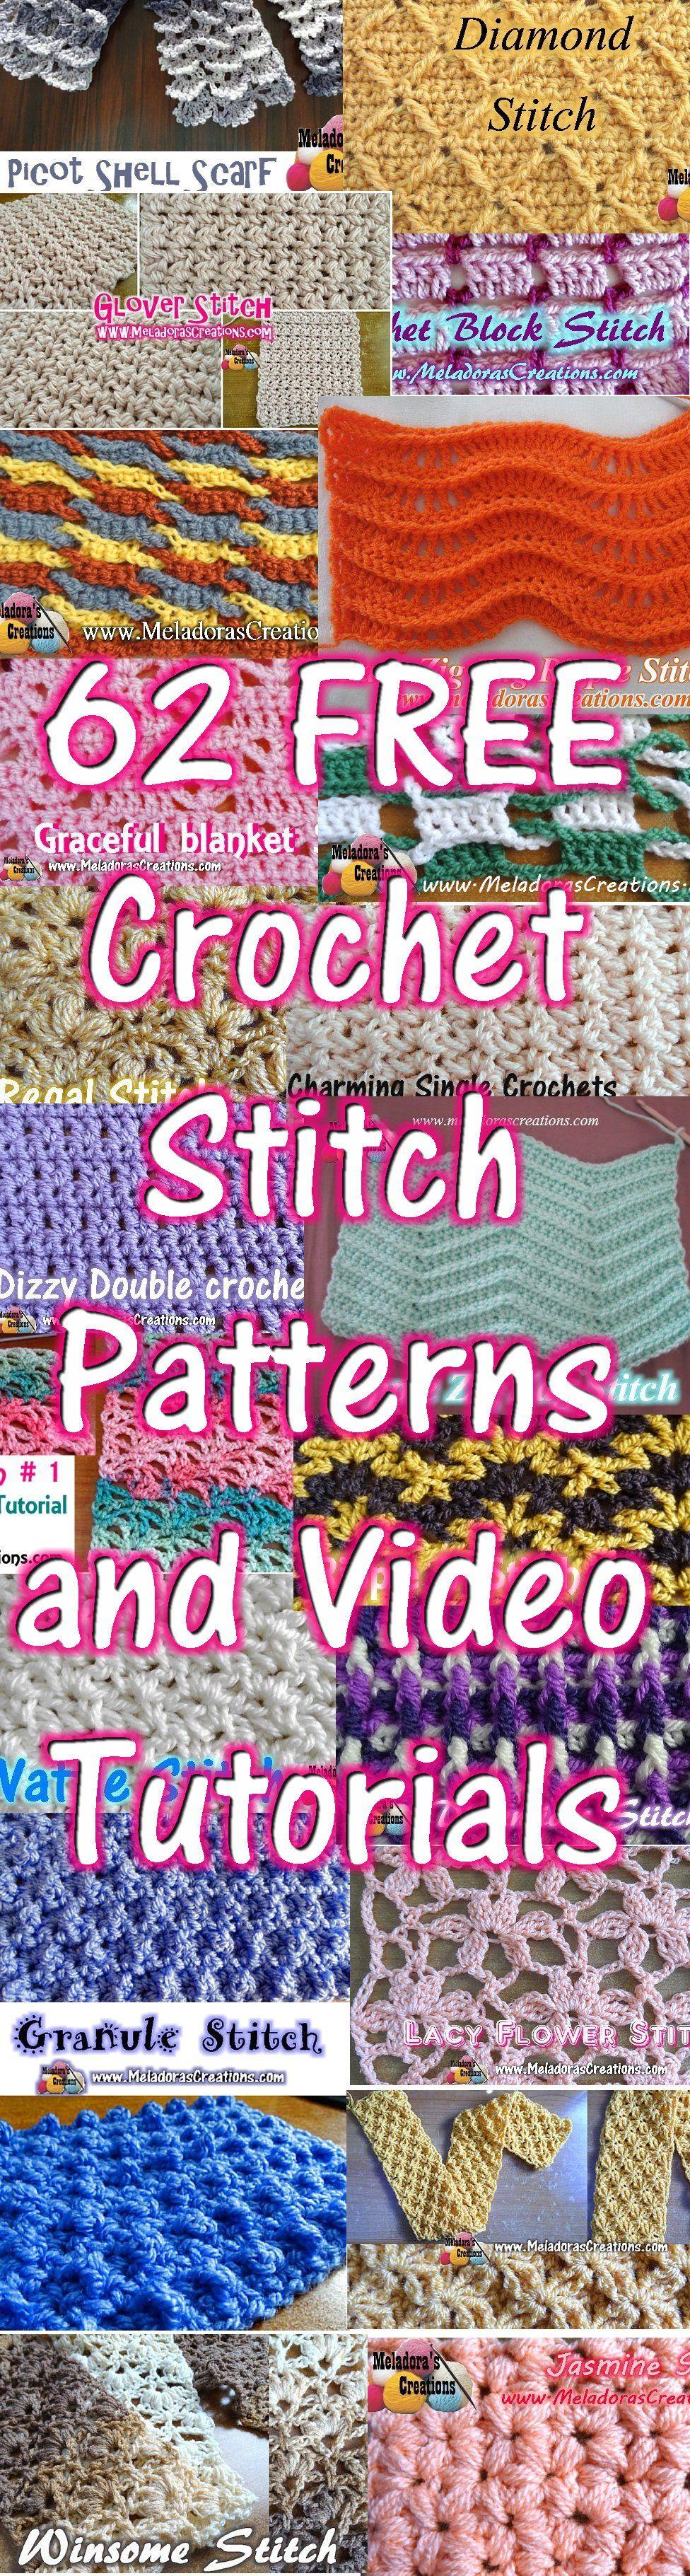 Crochet Stitch Patterns and Video | Tejidos | Pinterest | Häkeln ...